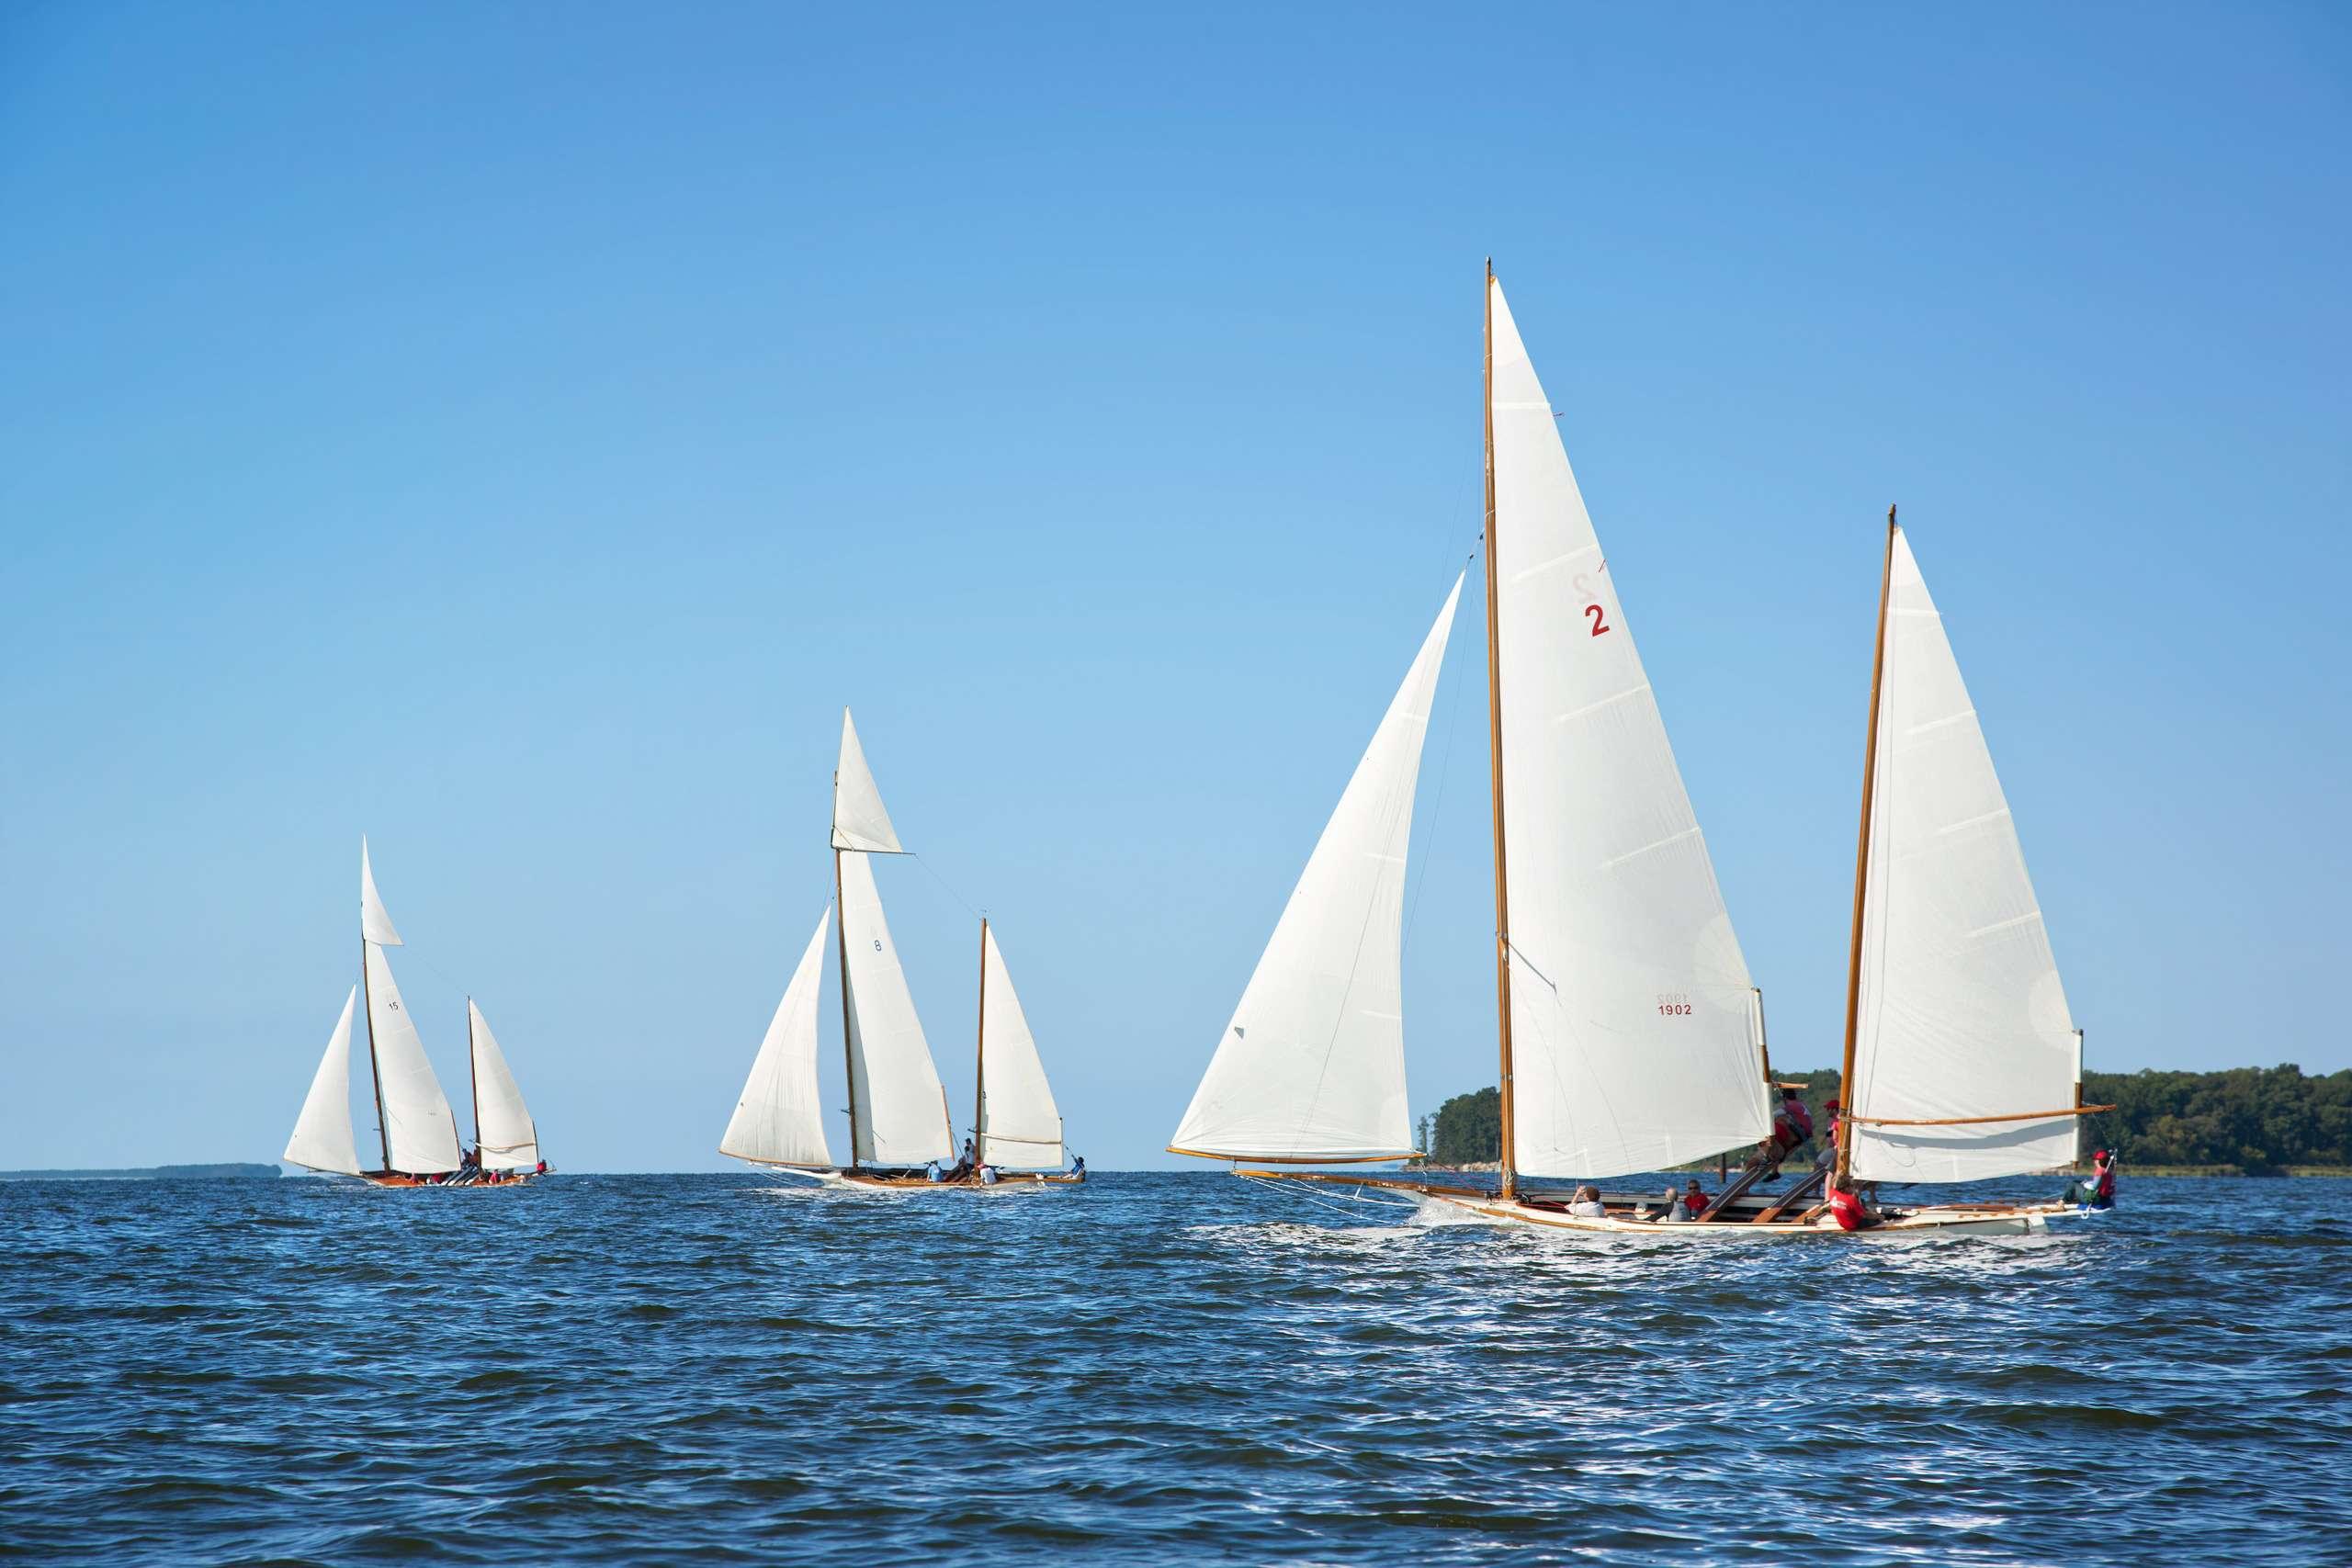 PORTFOLIO - Sailing - Log Canoes #9   PCG559